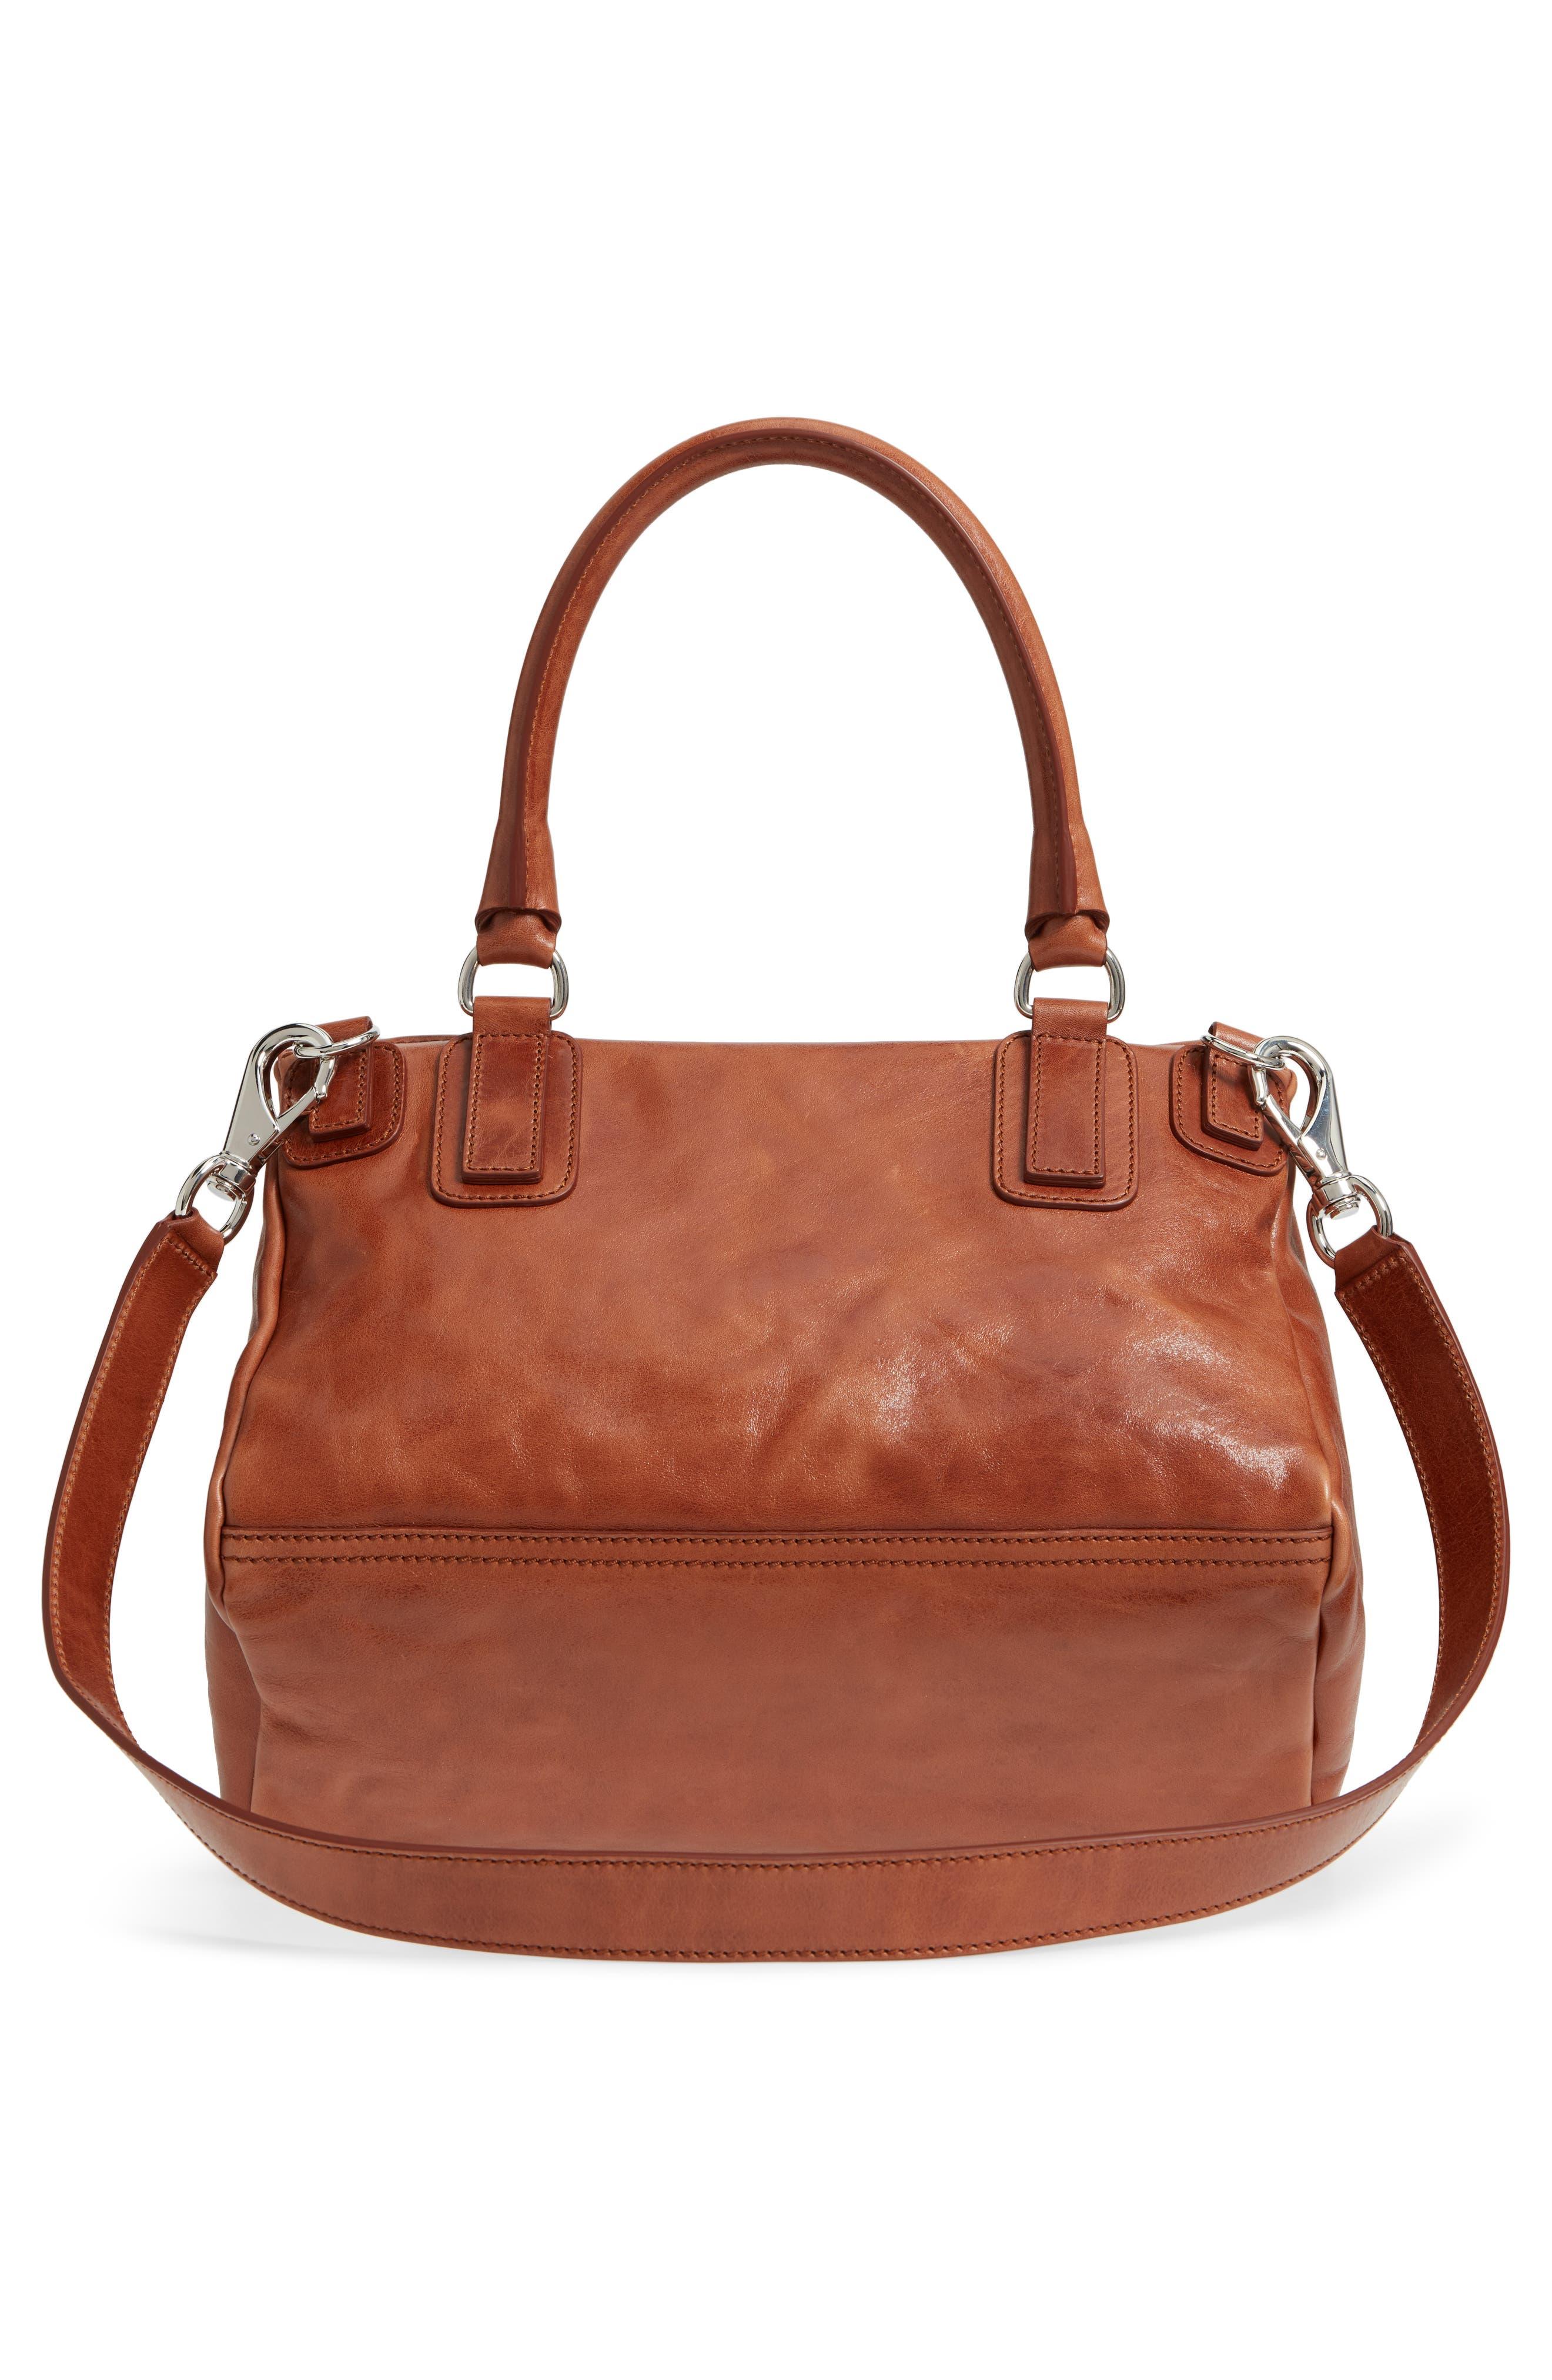 Medium Pandora Shiny Aged Leather Satchel,                             Alternate thumbnail 3, color,                             Cognac